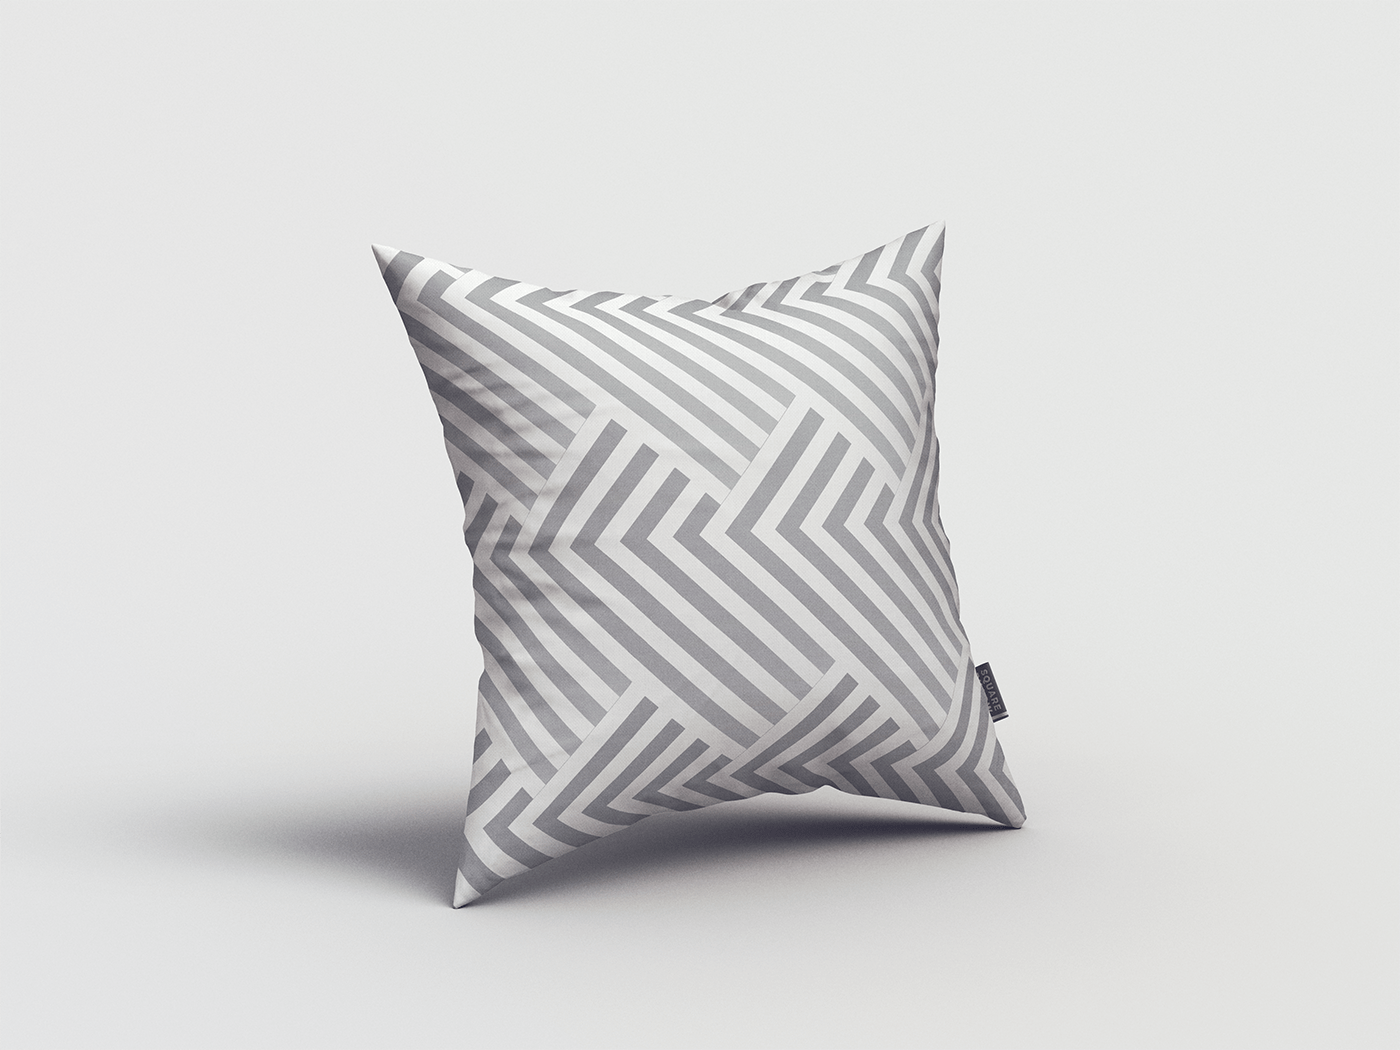 Mockup pillow psd free freebie square c4d